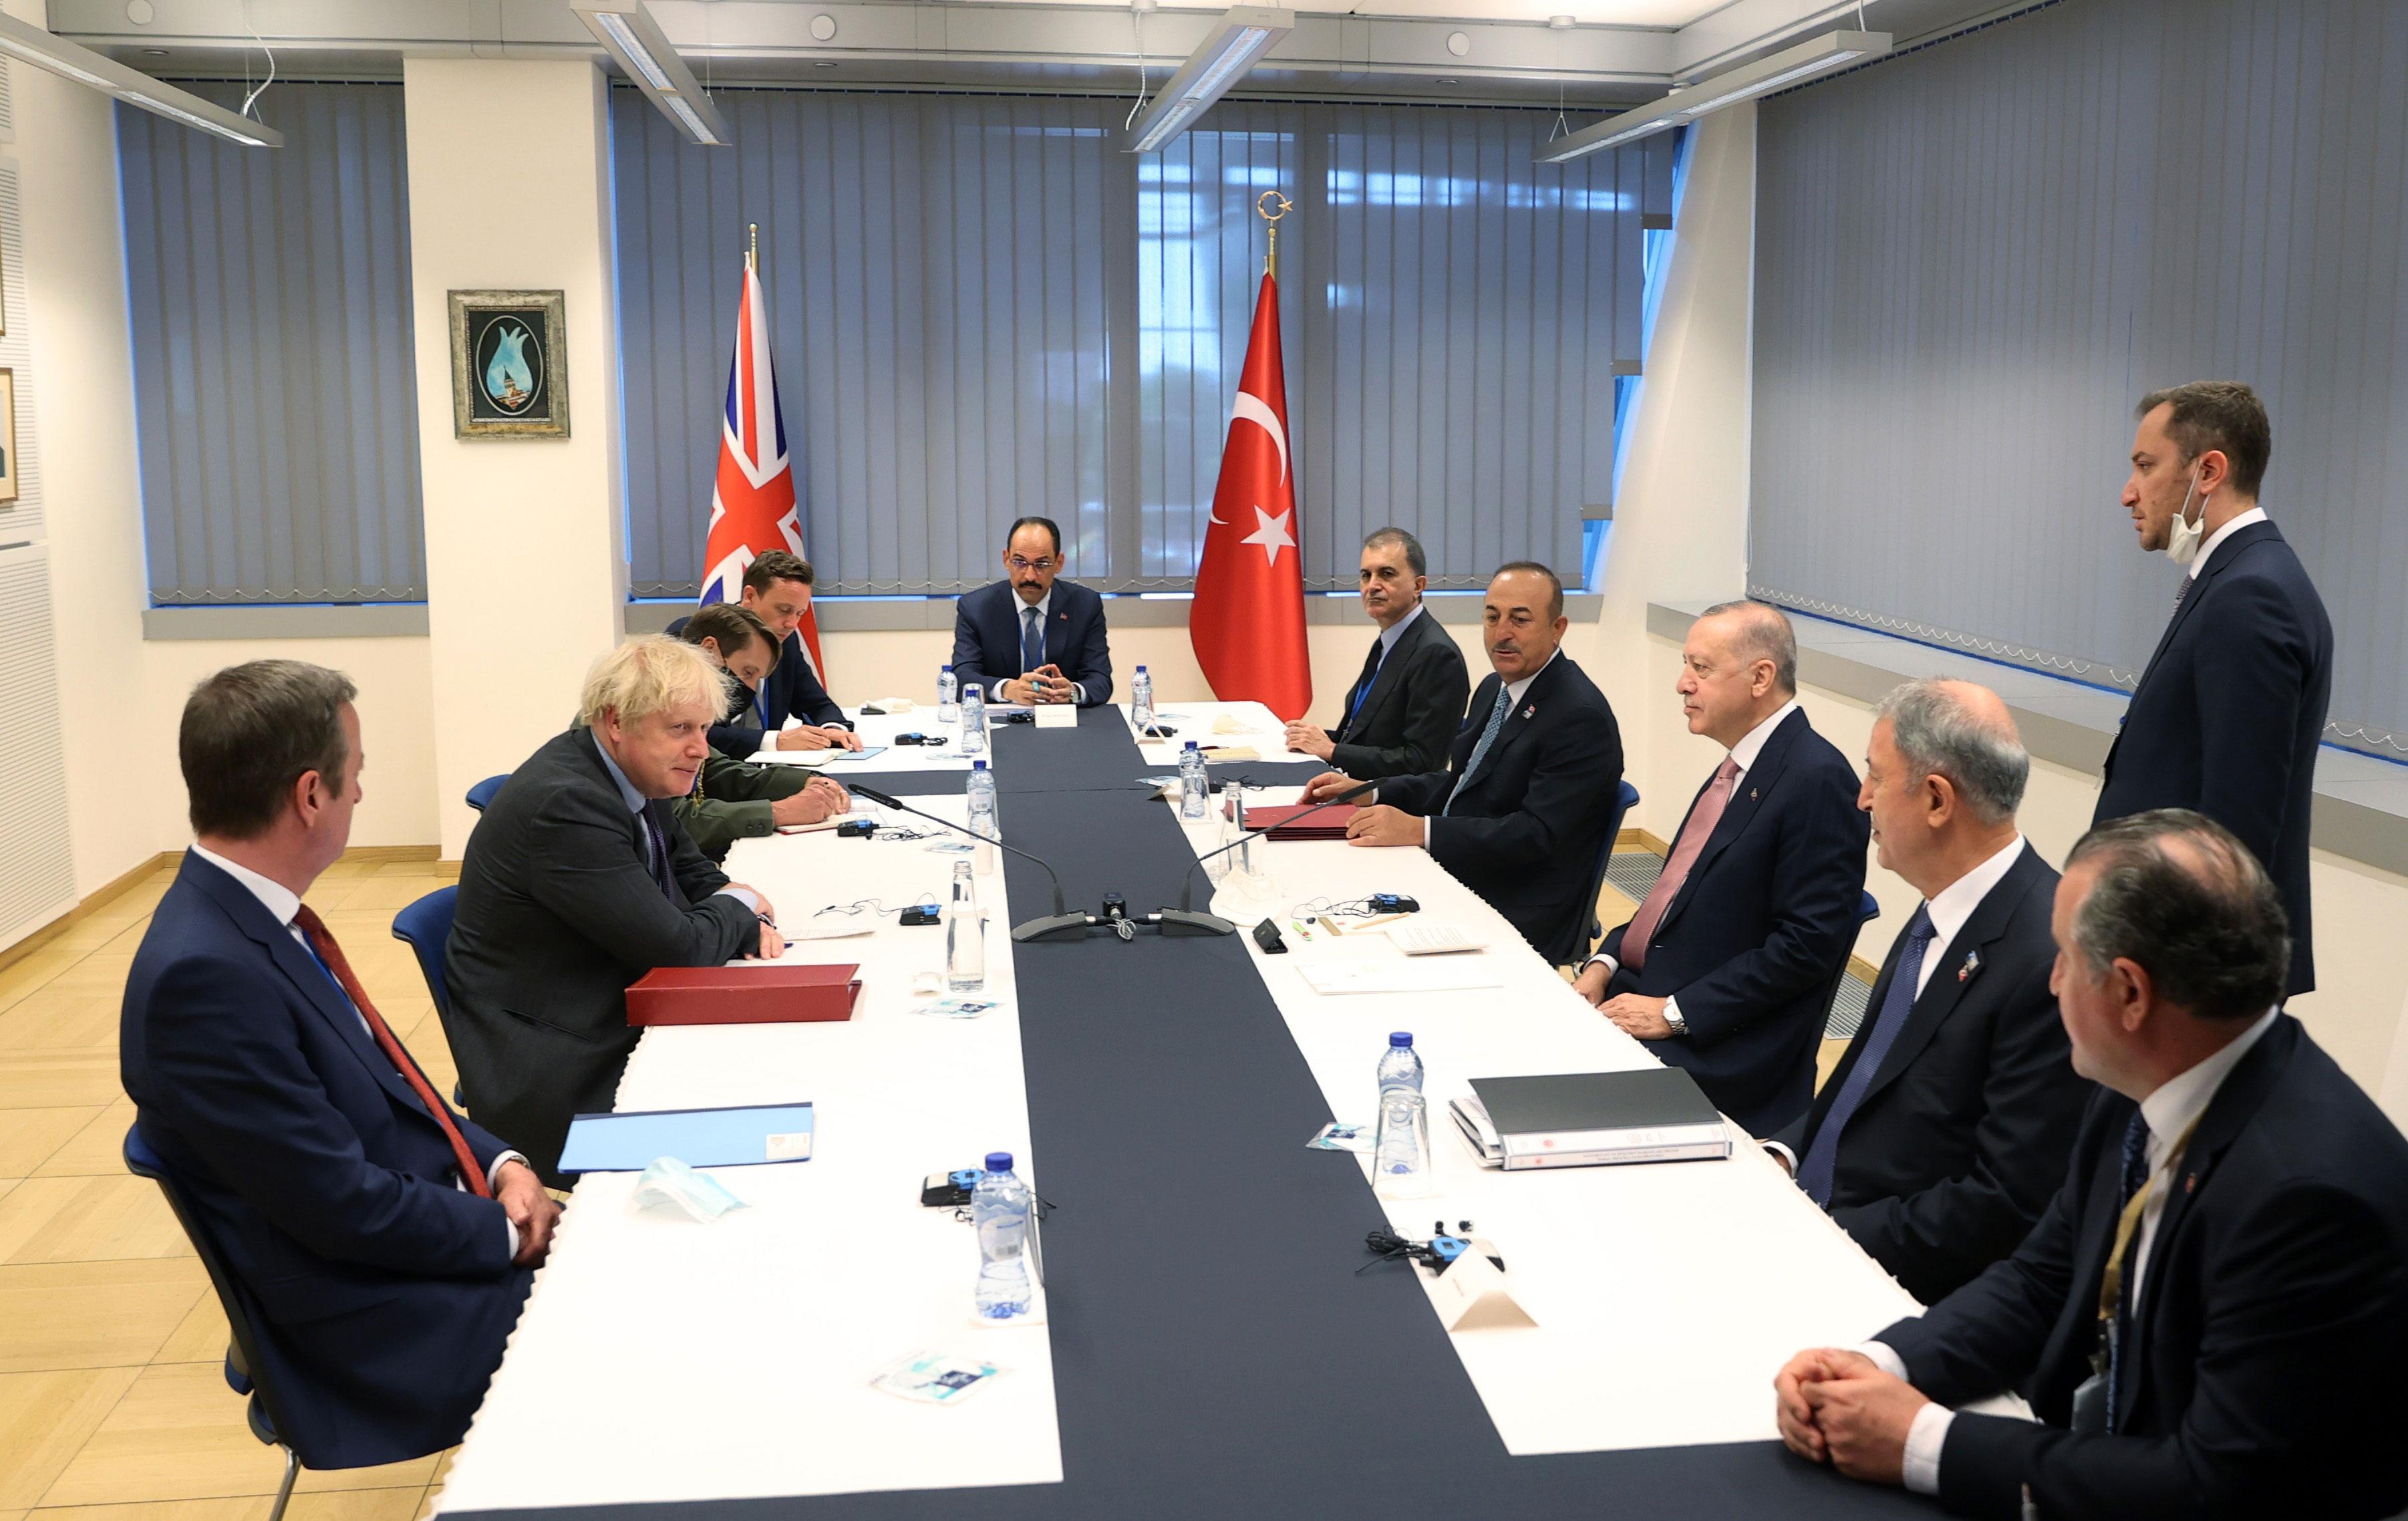 British Prime Minister Boris Johnson meets with Turkish President Recep Tayyip Erdogan in Brussels, Belgium, on June 14.